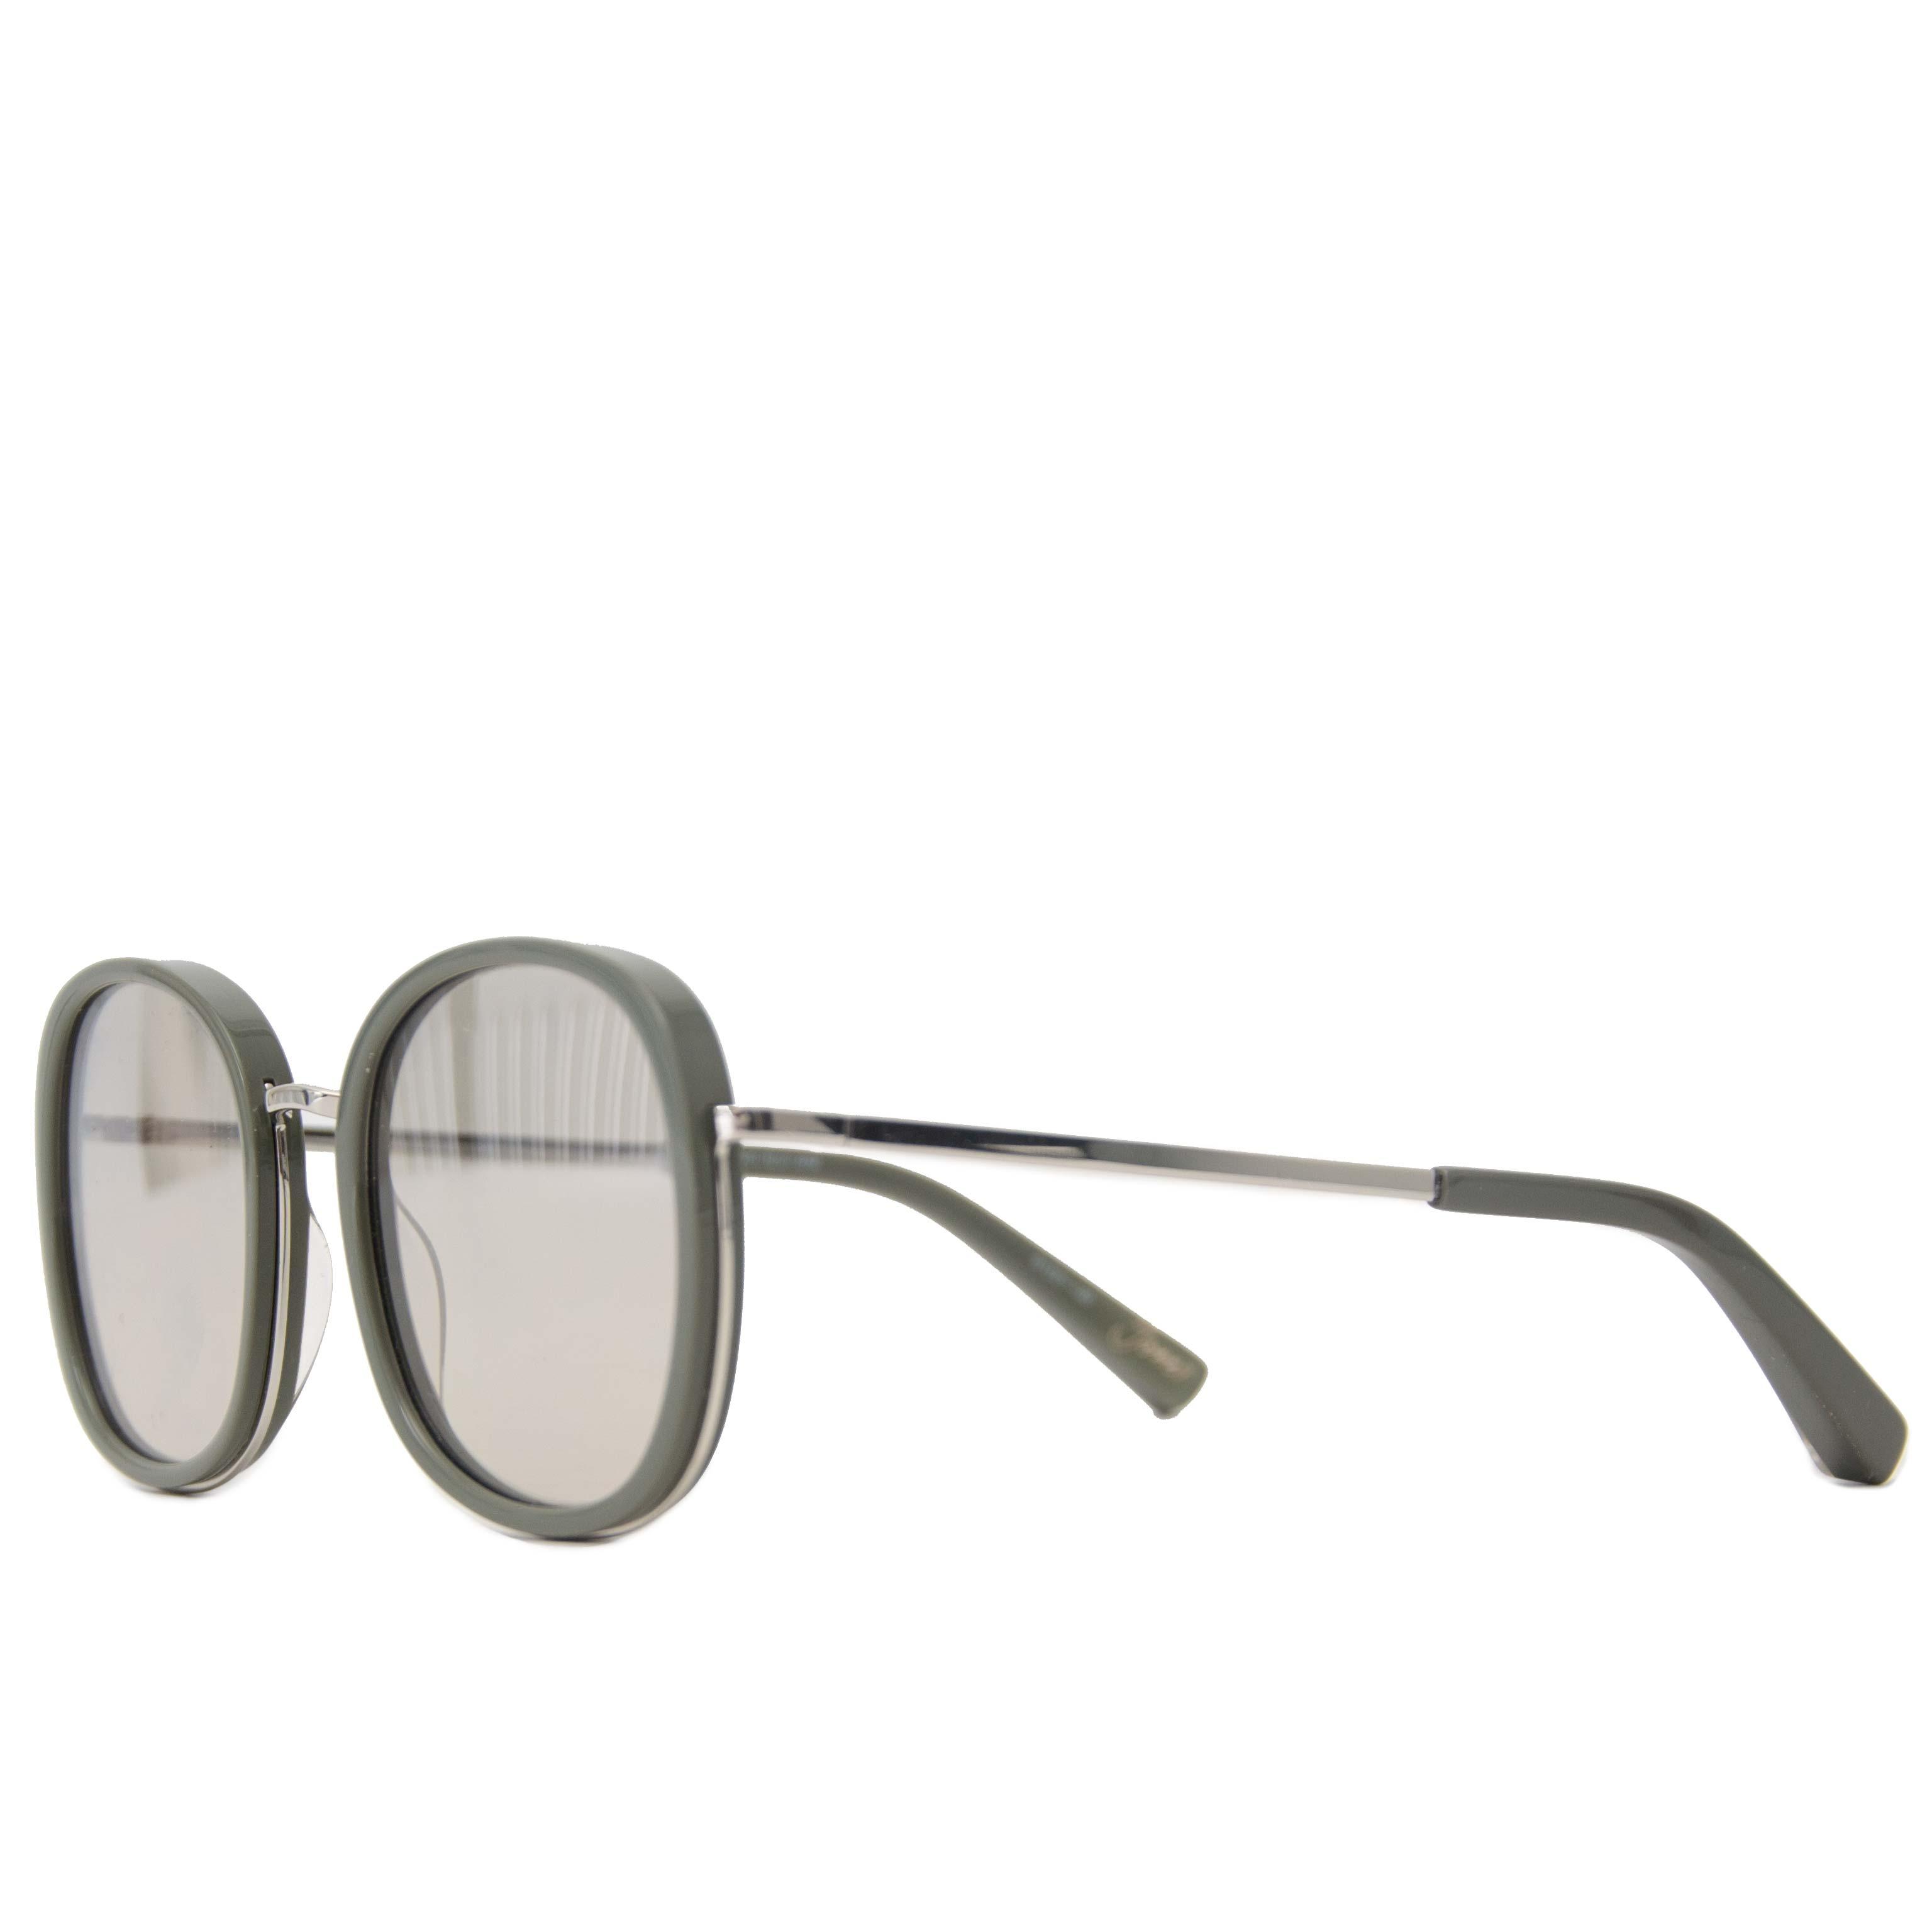 Elizabeth and James Olive Sunglasses Buy authentic designer secondhand sunglasses at Labellov at the best price. Safe and secure shopping. Koop tweedehands authentieke zonnebrillen bij designer webwinkel labellov.